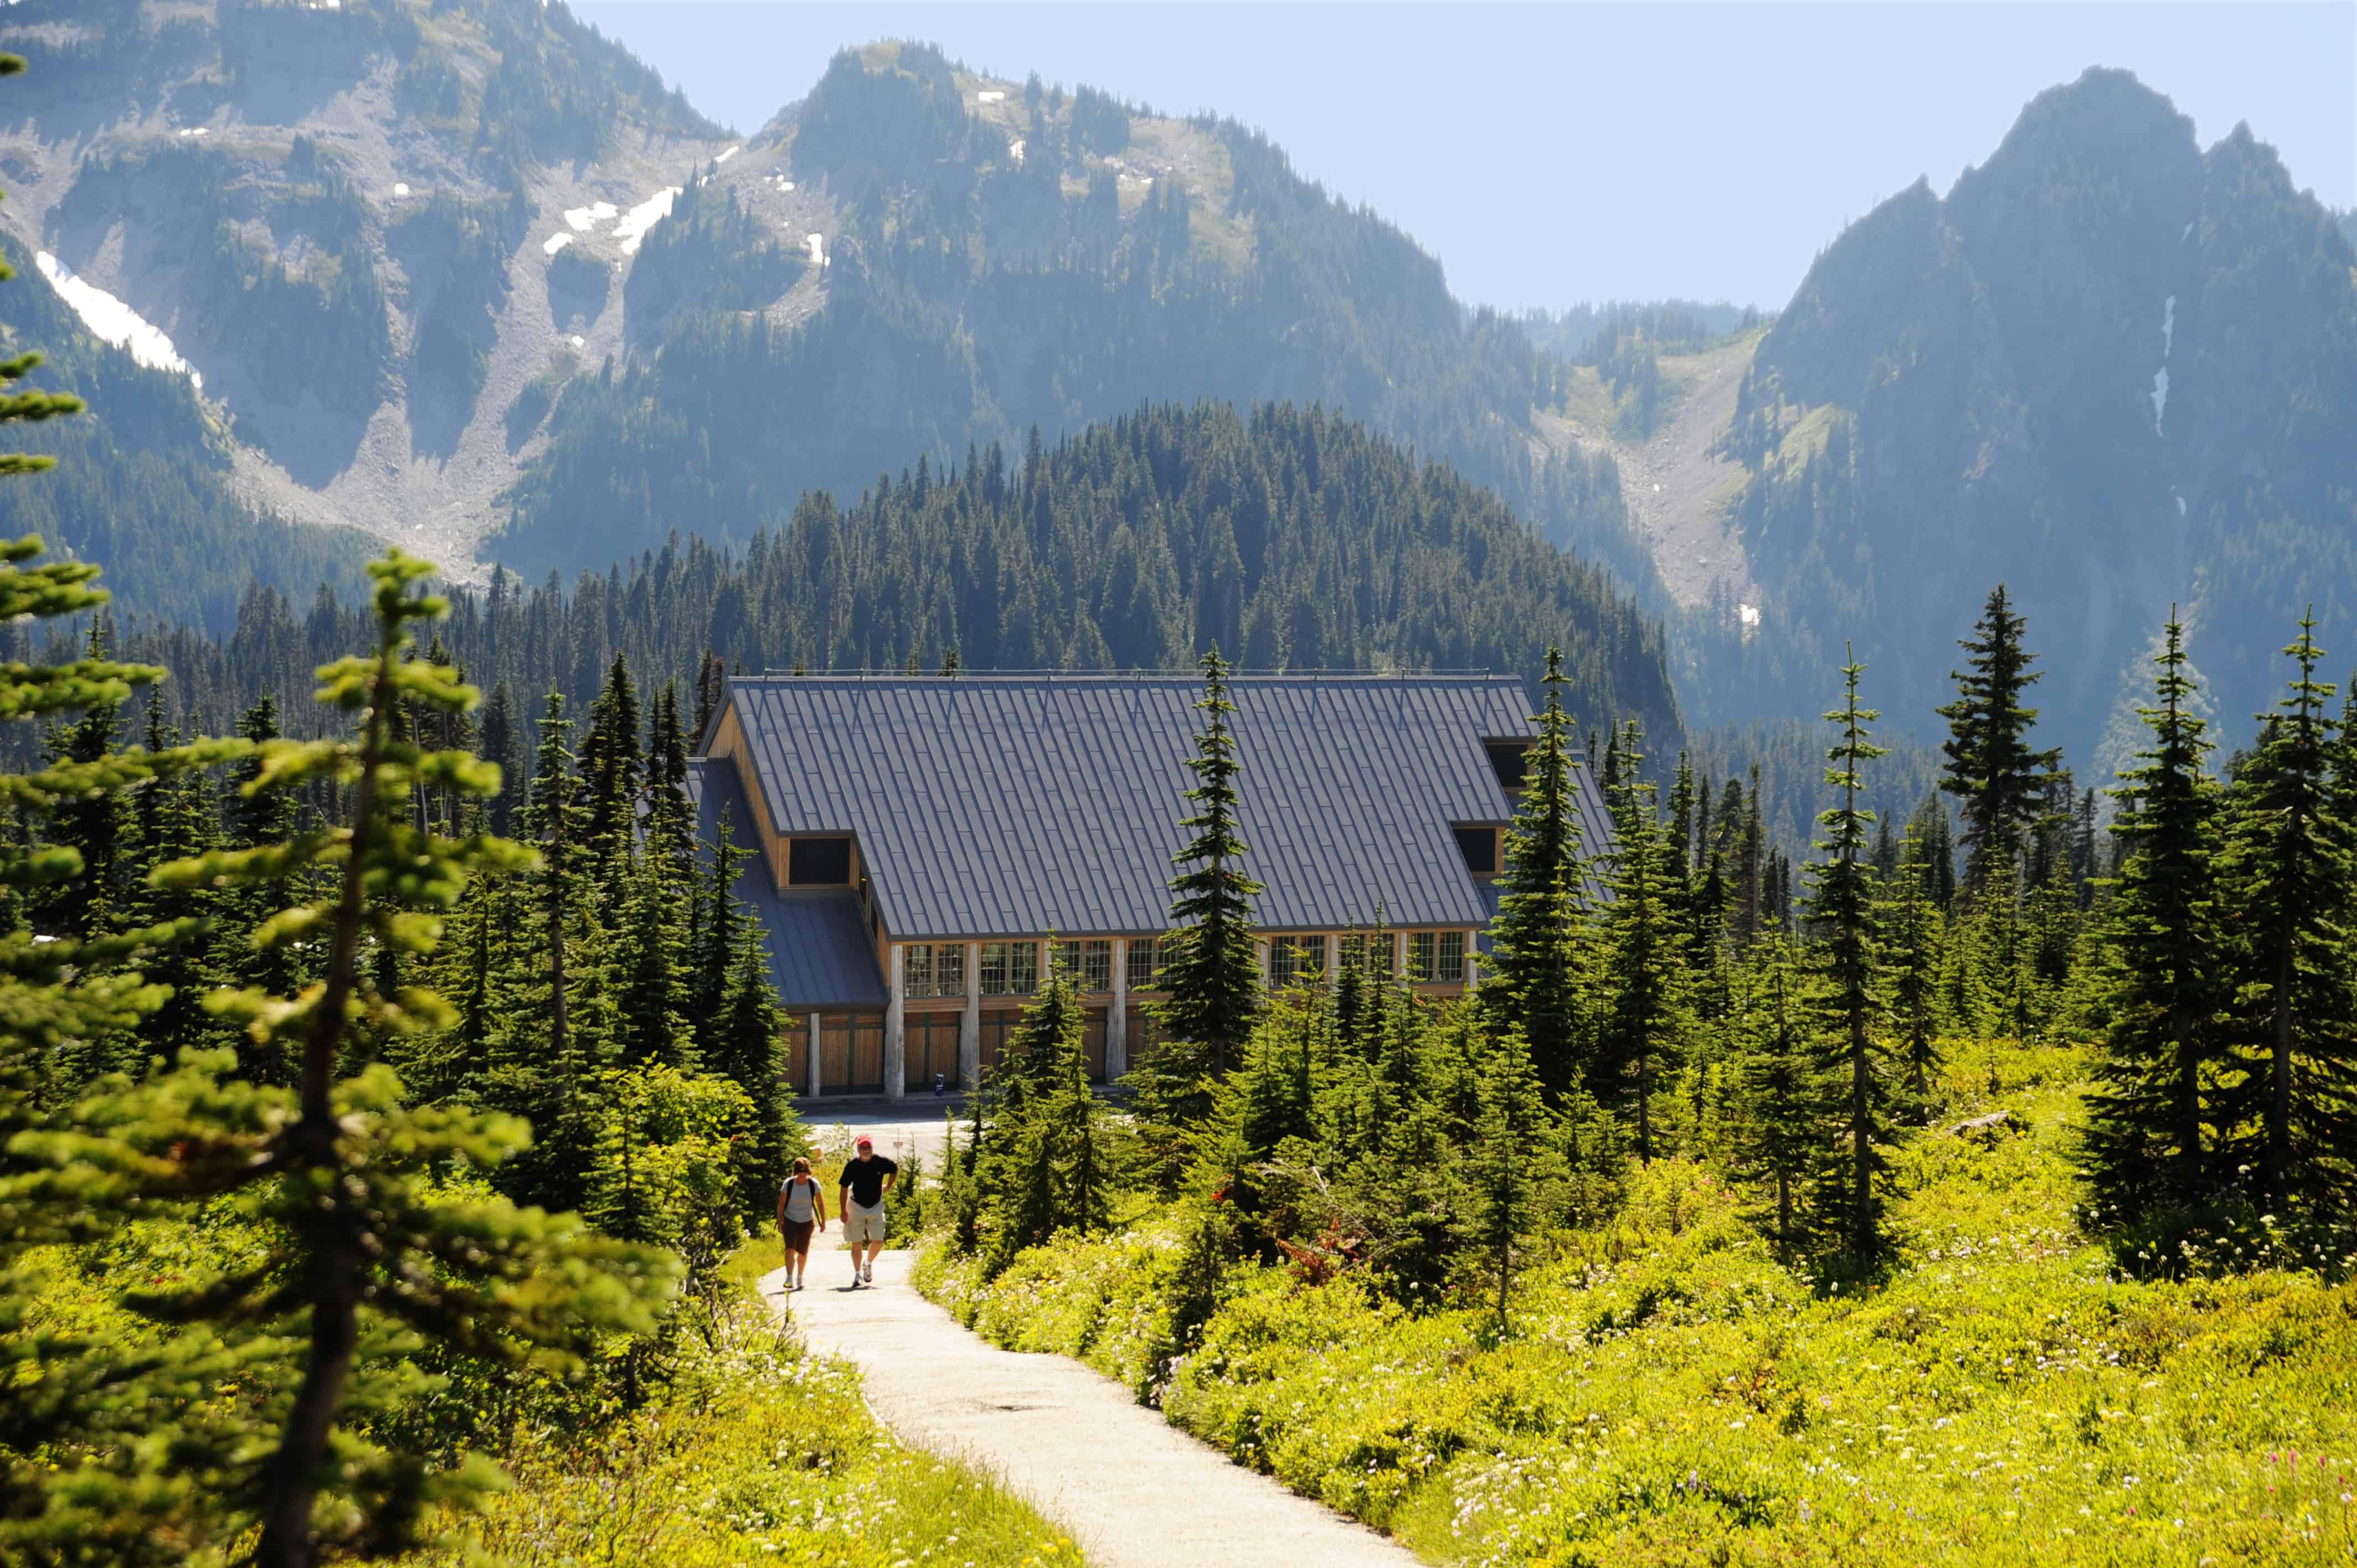 Visitor Center at Paradise, Mt Rainier National Park